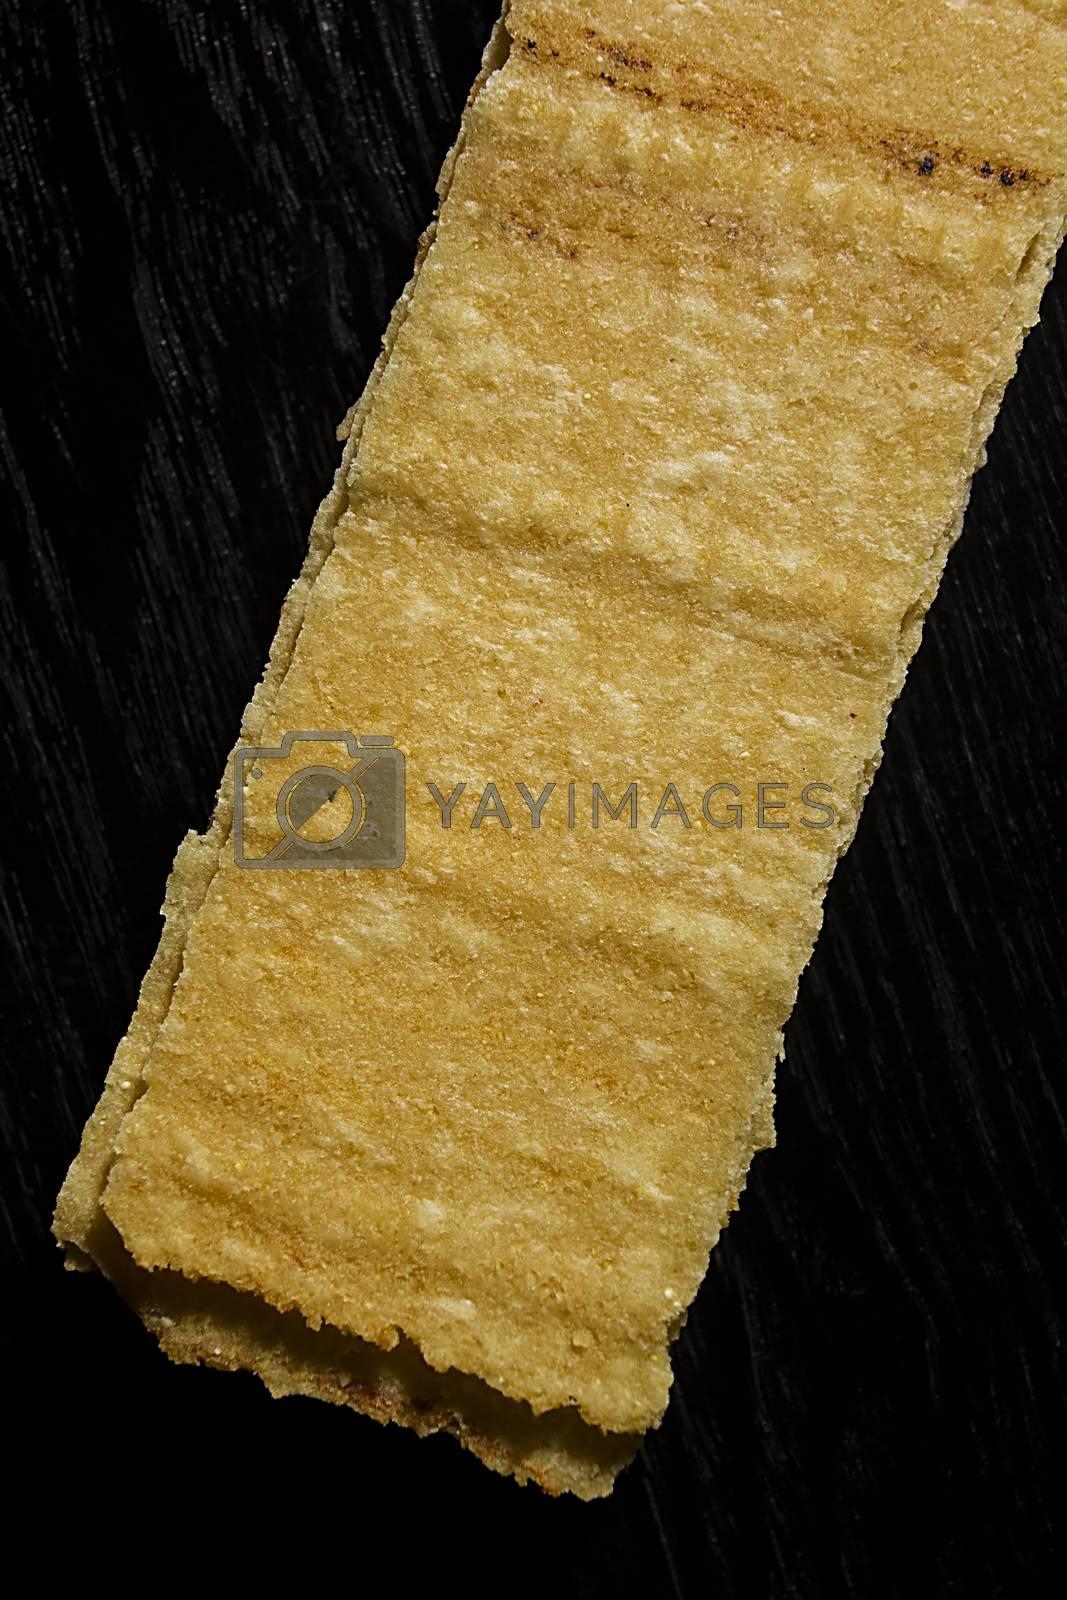 Rectangular potato chips on black wooden background